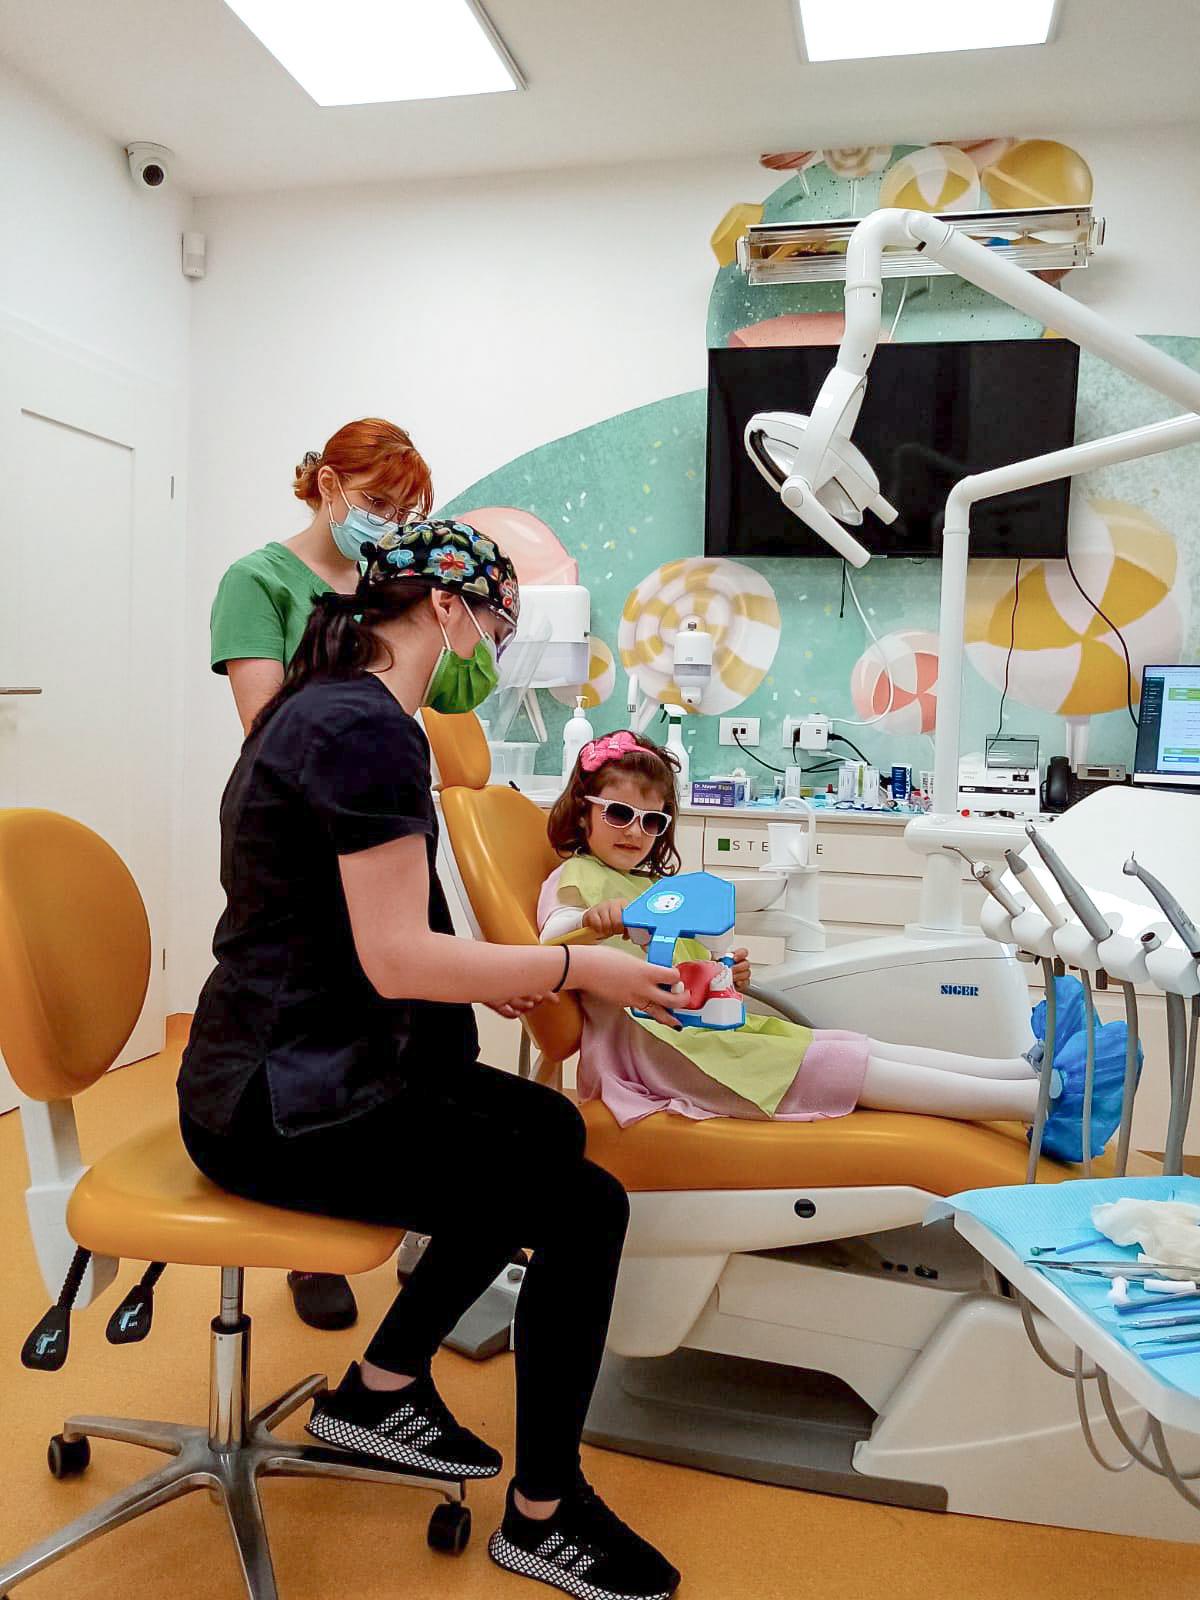 medic stomatolog in stanga, micuta pacienta pe scaunul stomatologic